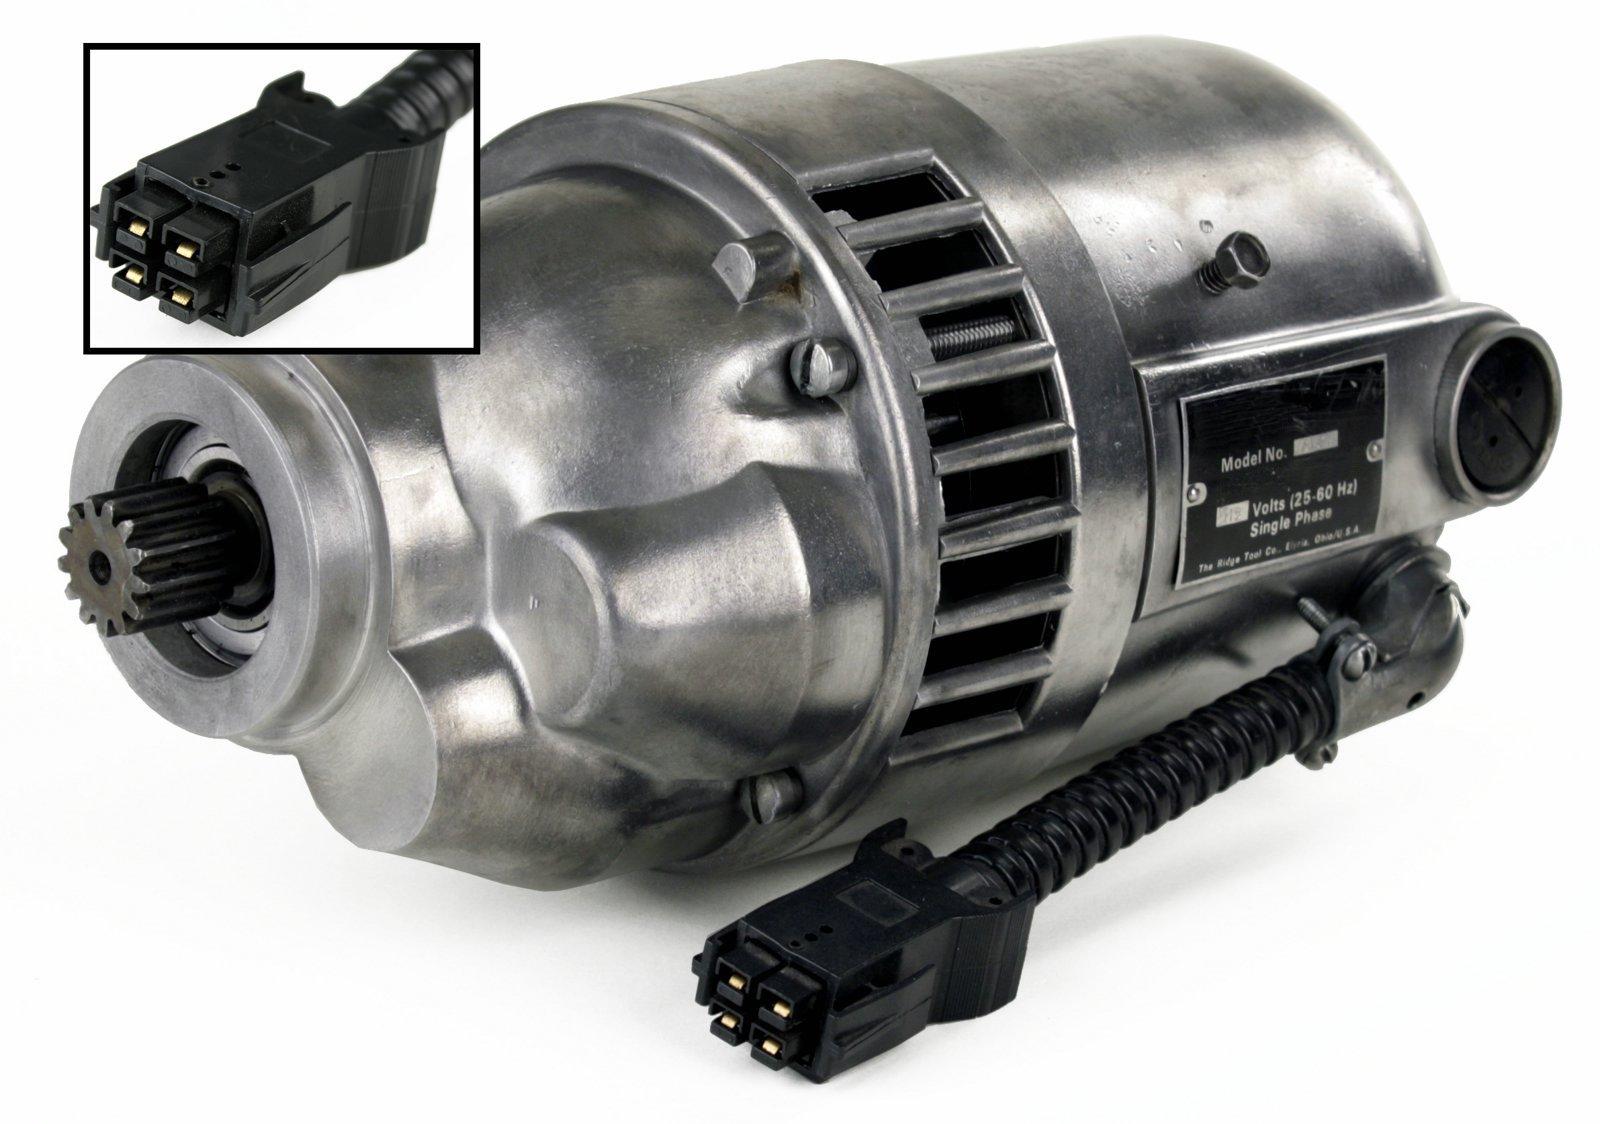 RIDGID 87740 Motor and Gear Box with Black Plug (Certified Refurbished)